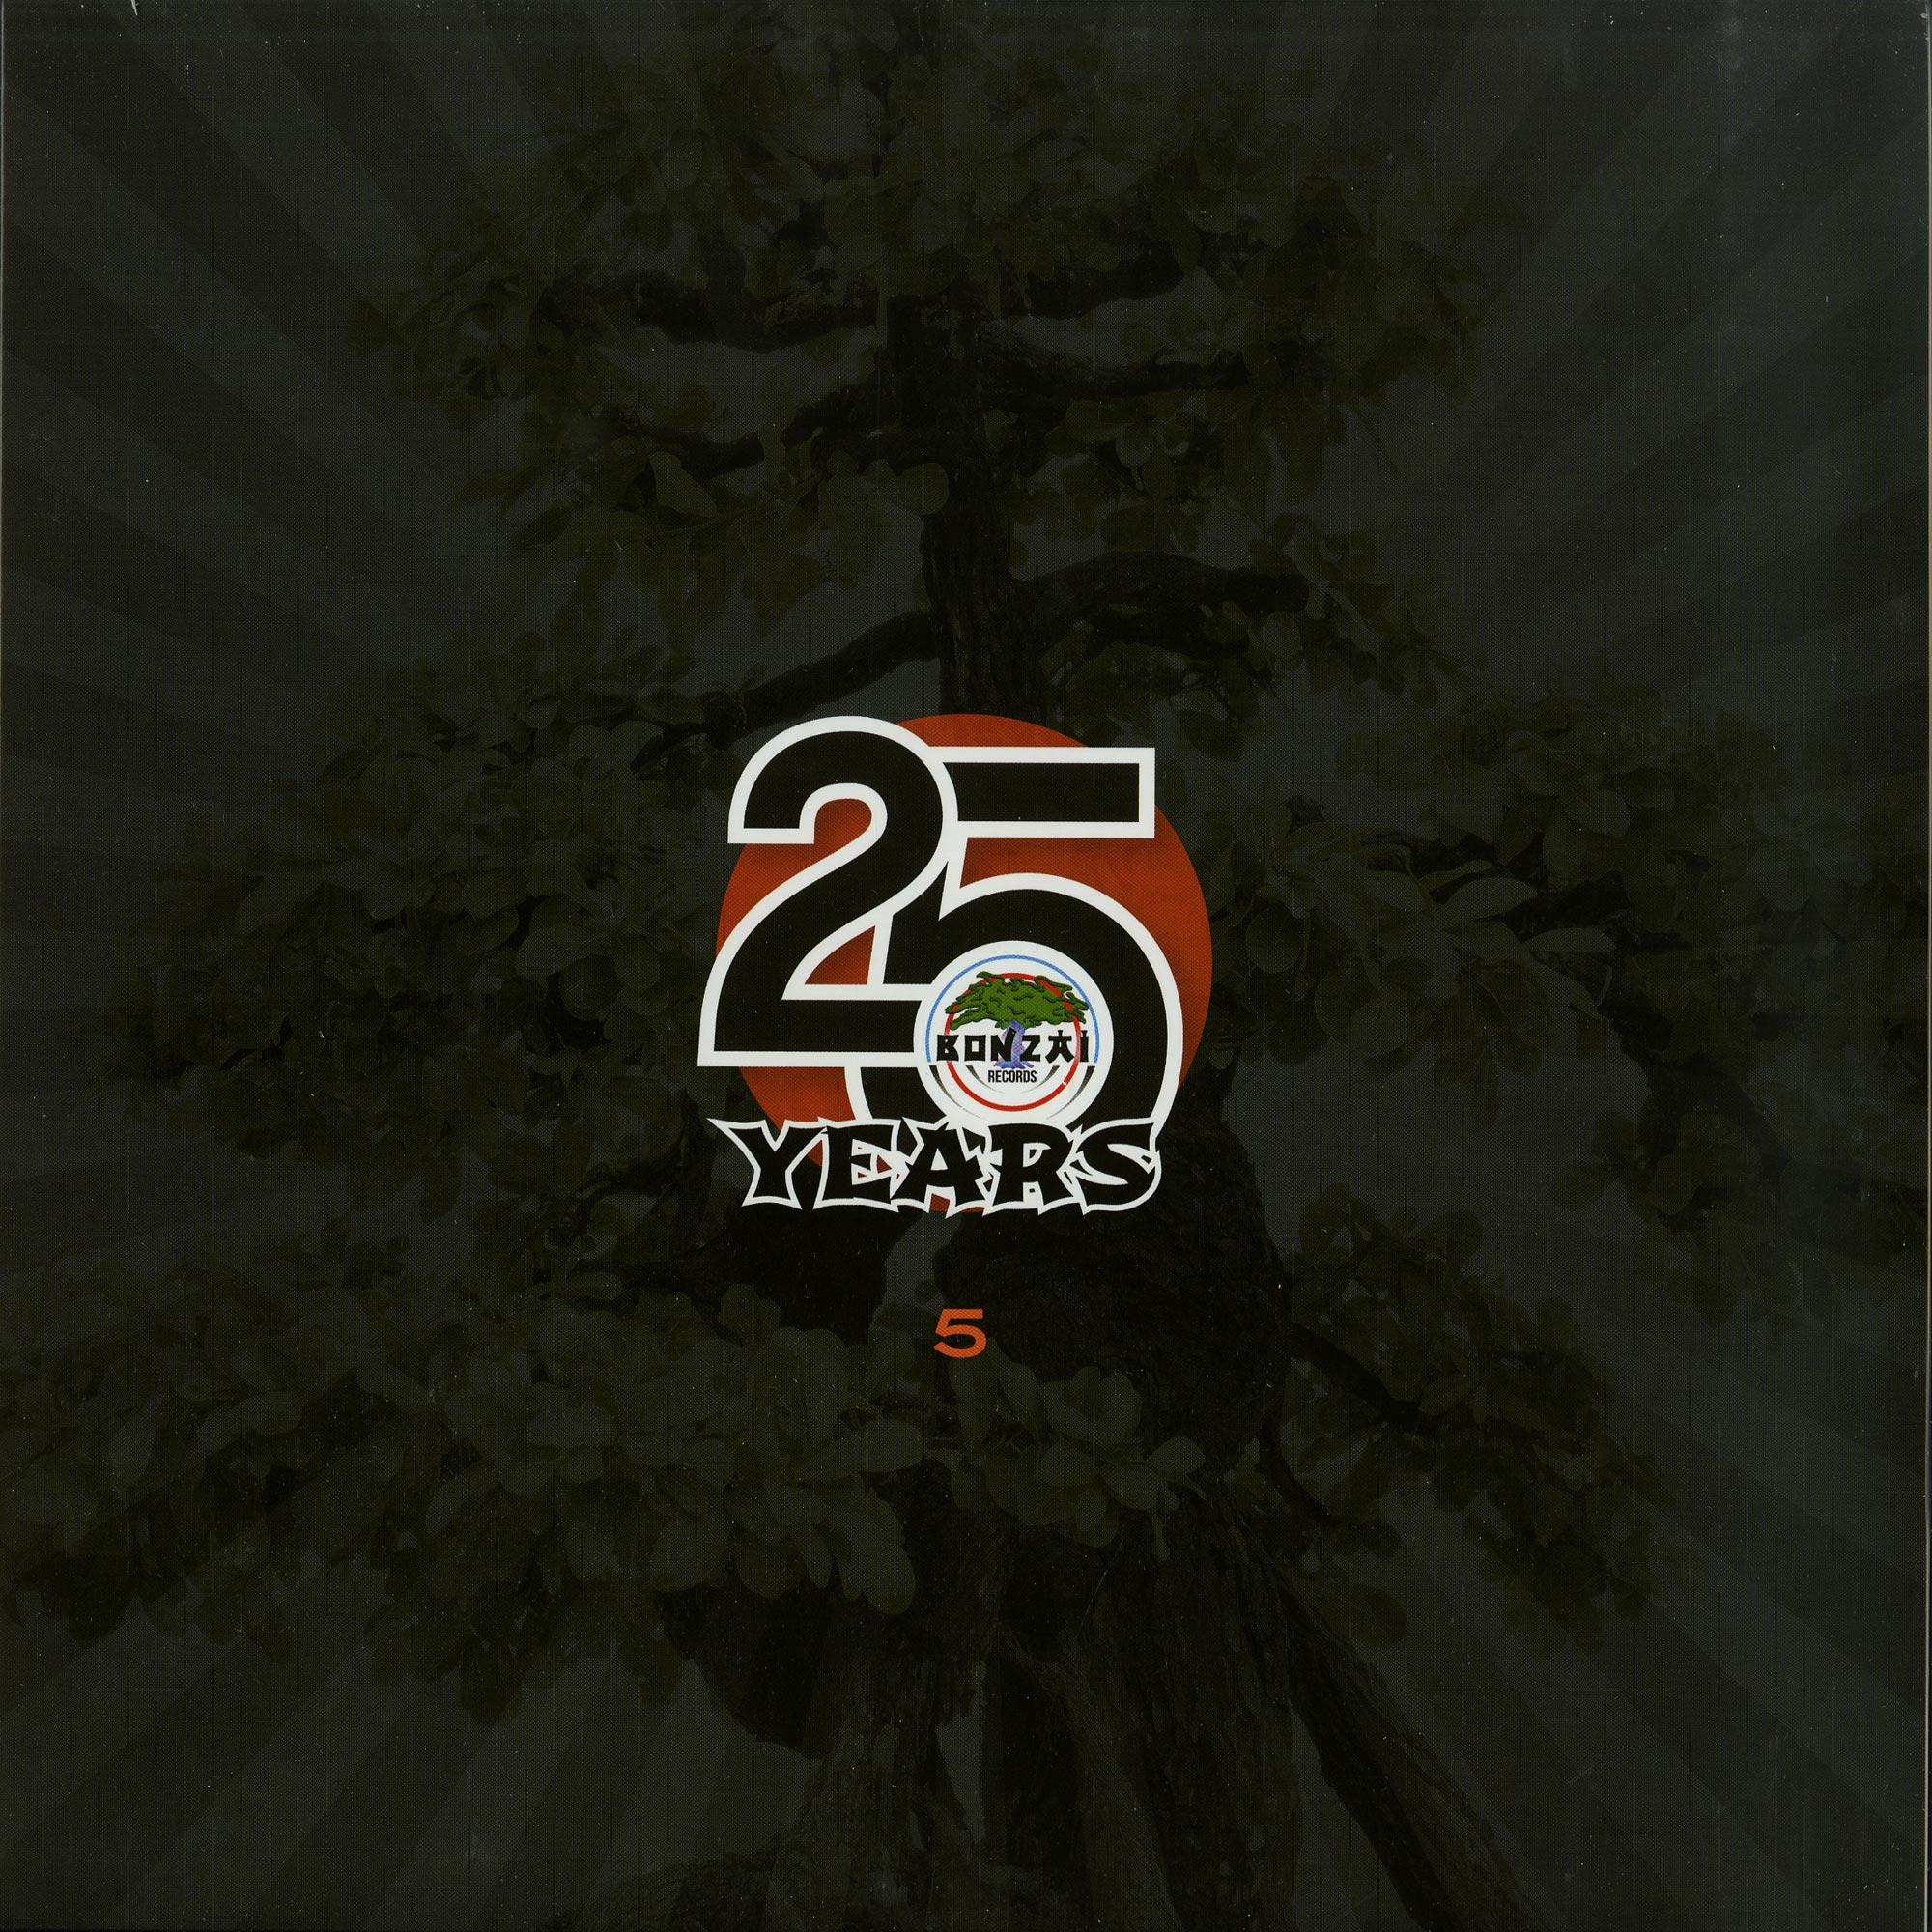 Da Hool / DJ Looney Tune / Bountyhunter - PT 5 - 25 YEARS OF BONZAI